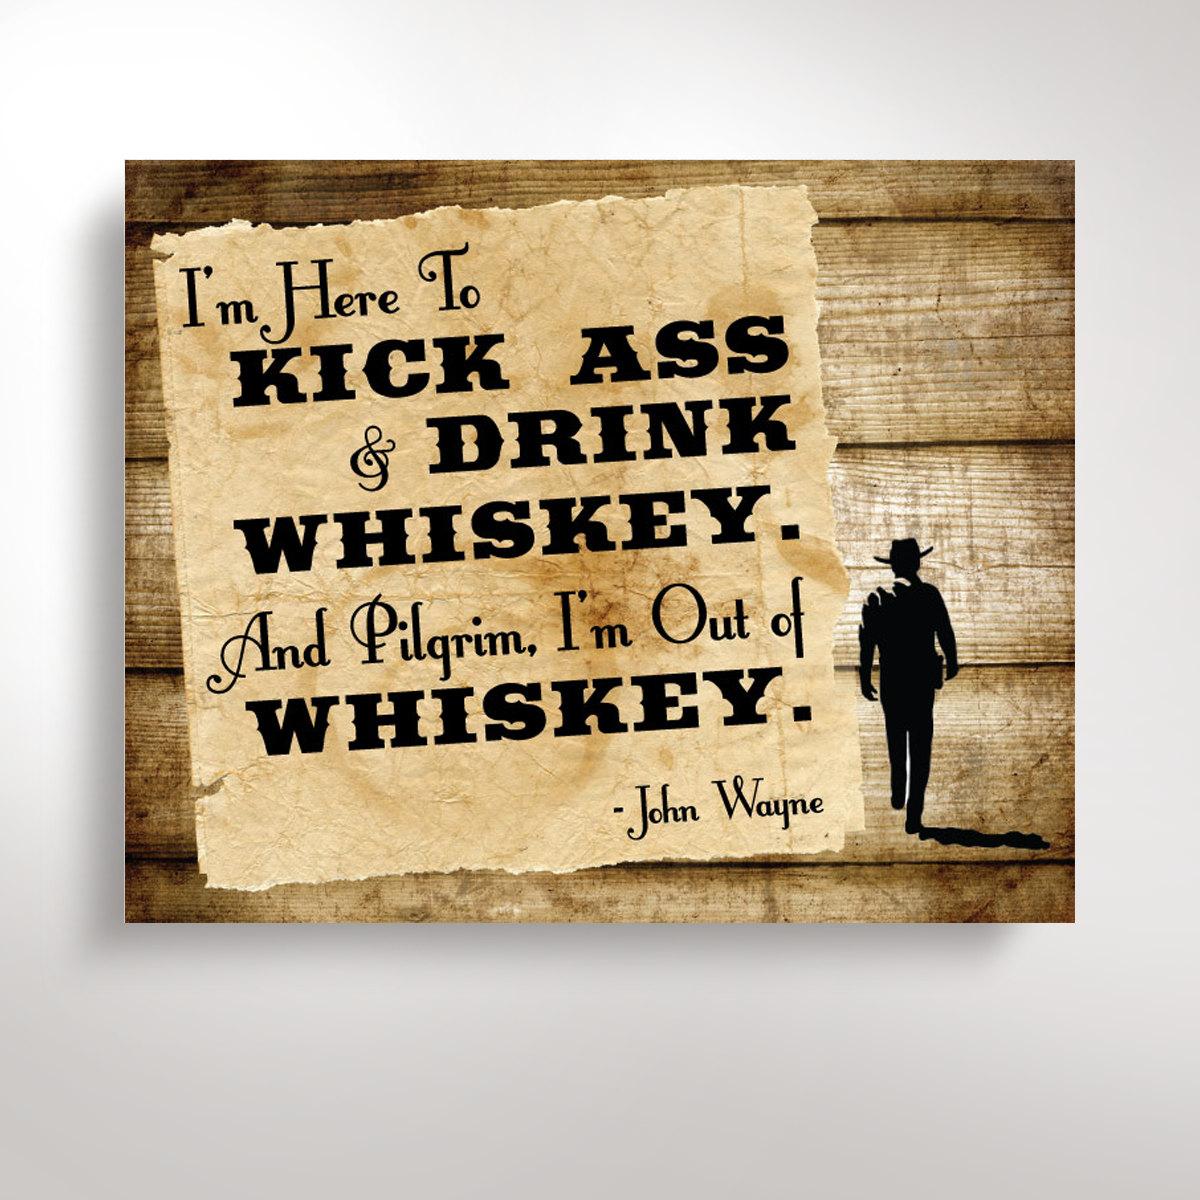 John Wayne The Shootist Quotes. QuotesGram